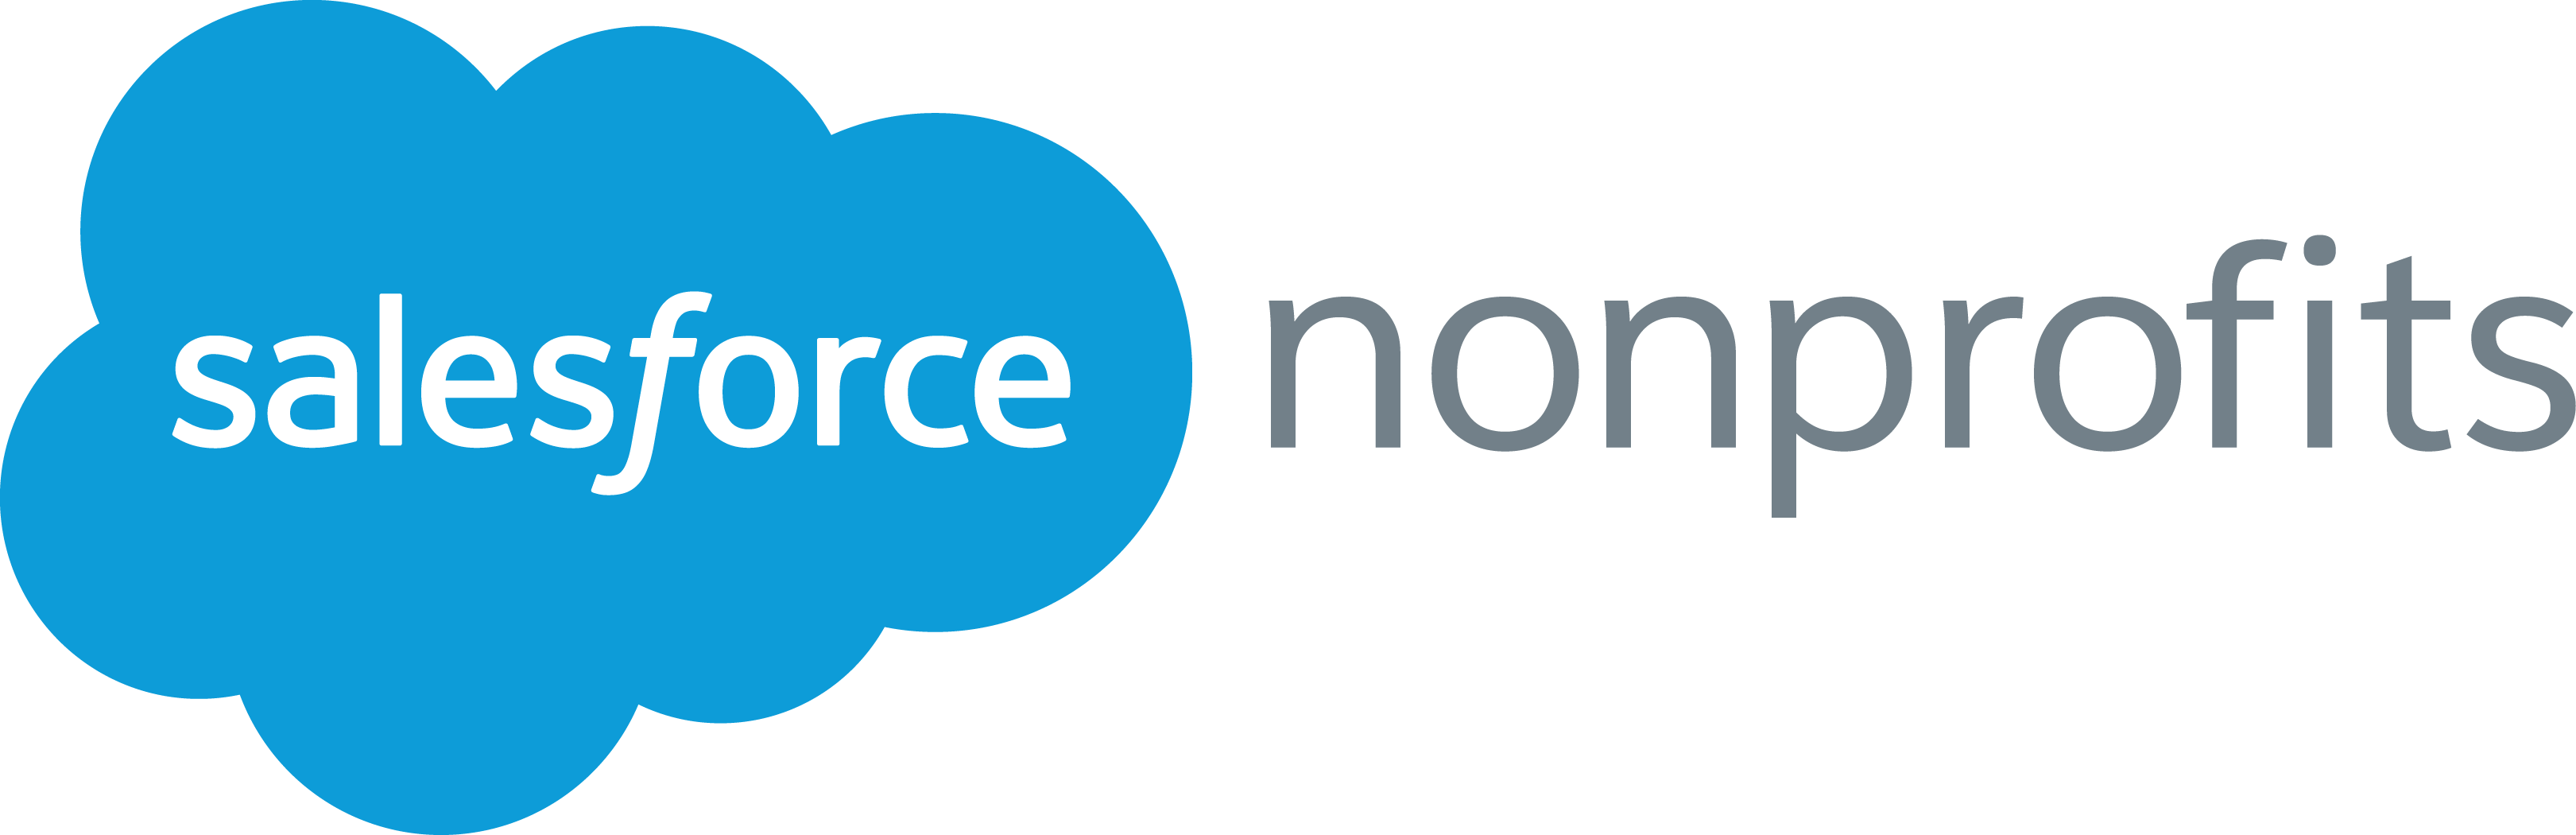 Salesforce: Nonprofit